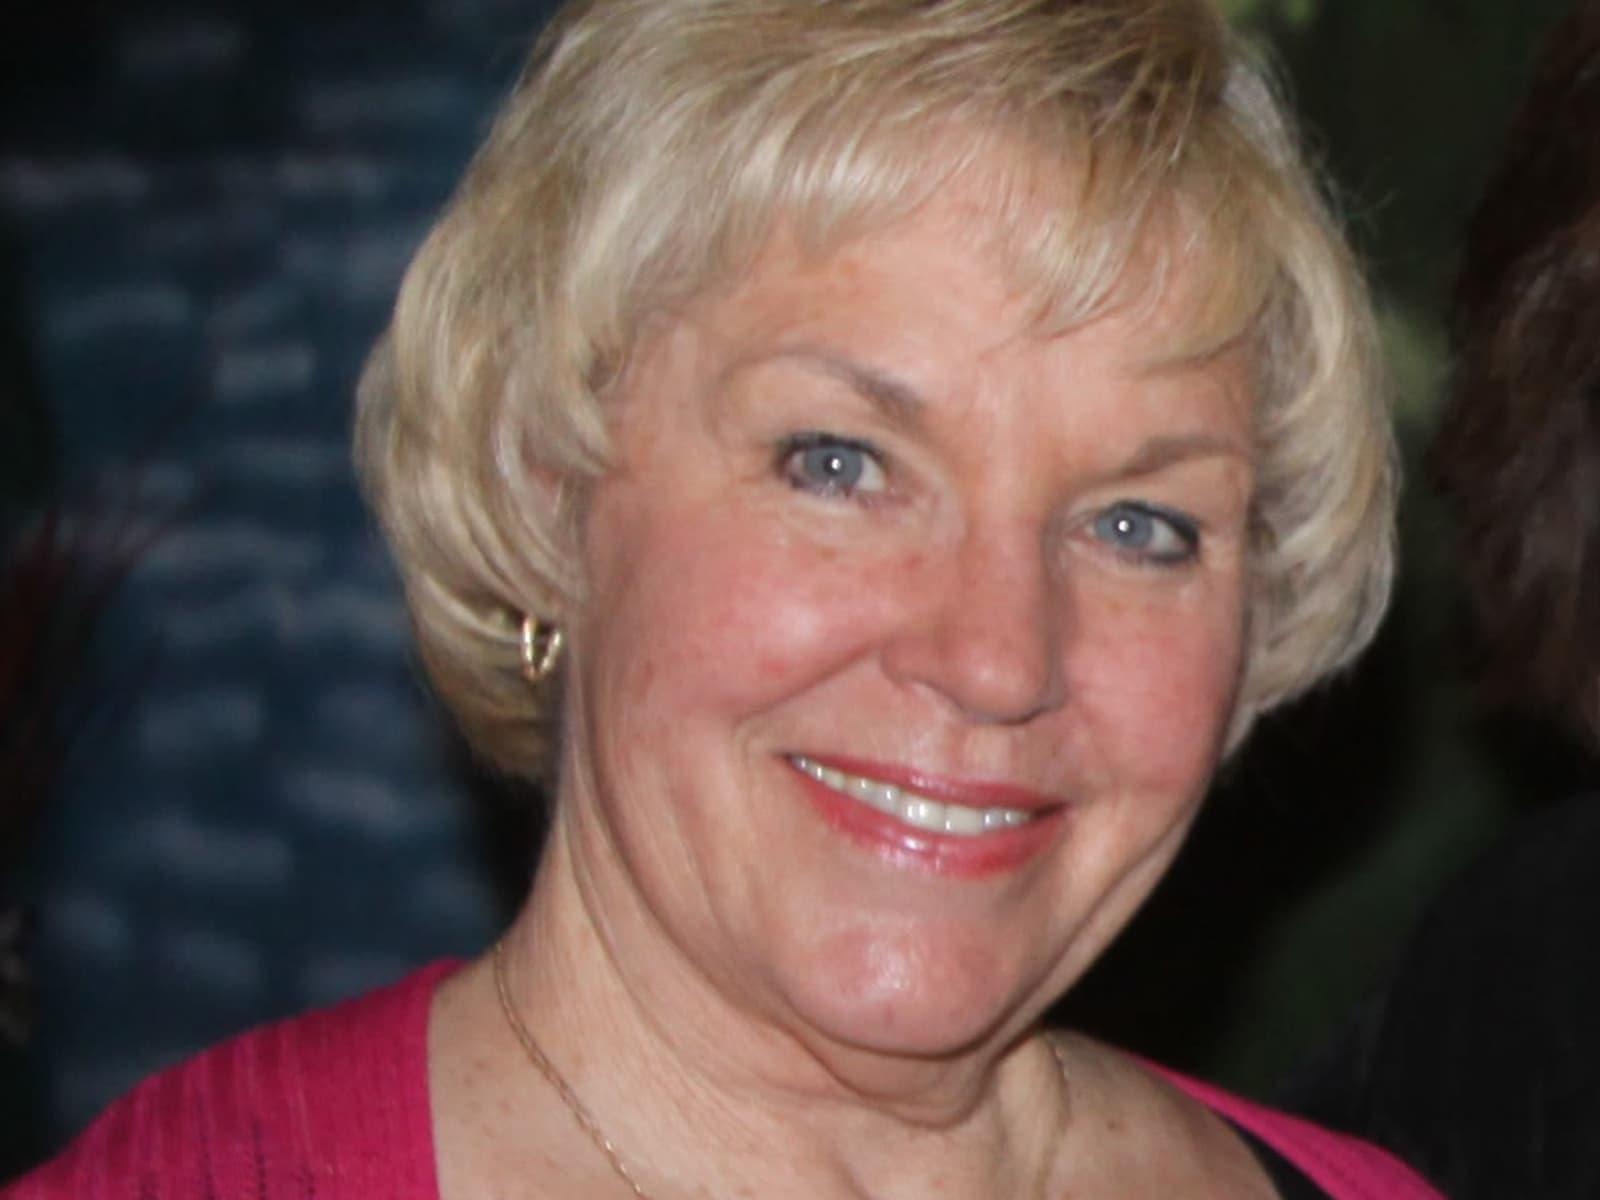 Martha from Rancho Palos Verdes, California, United States